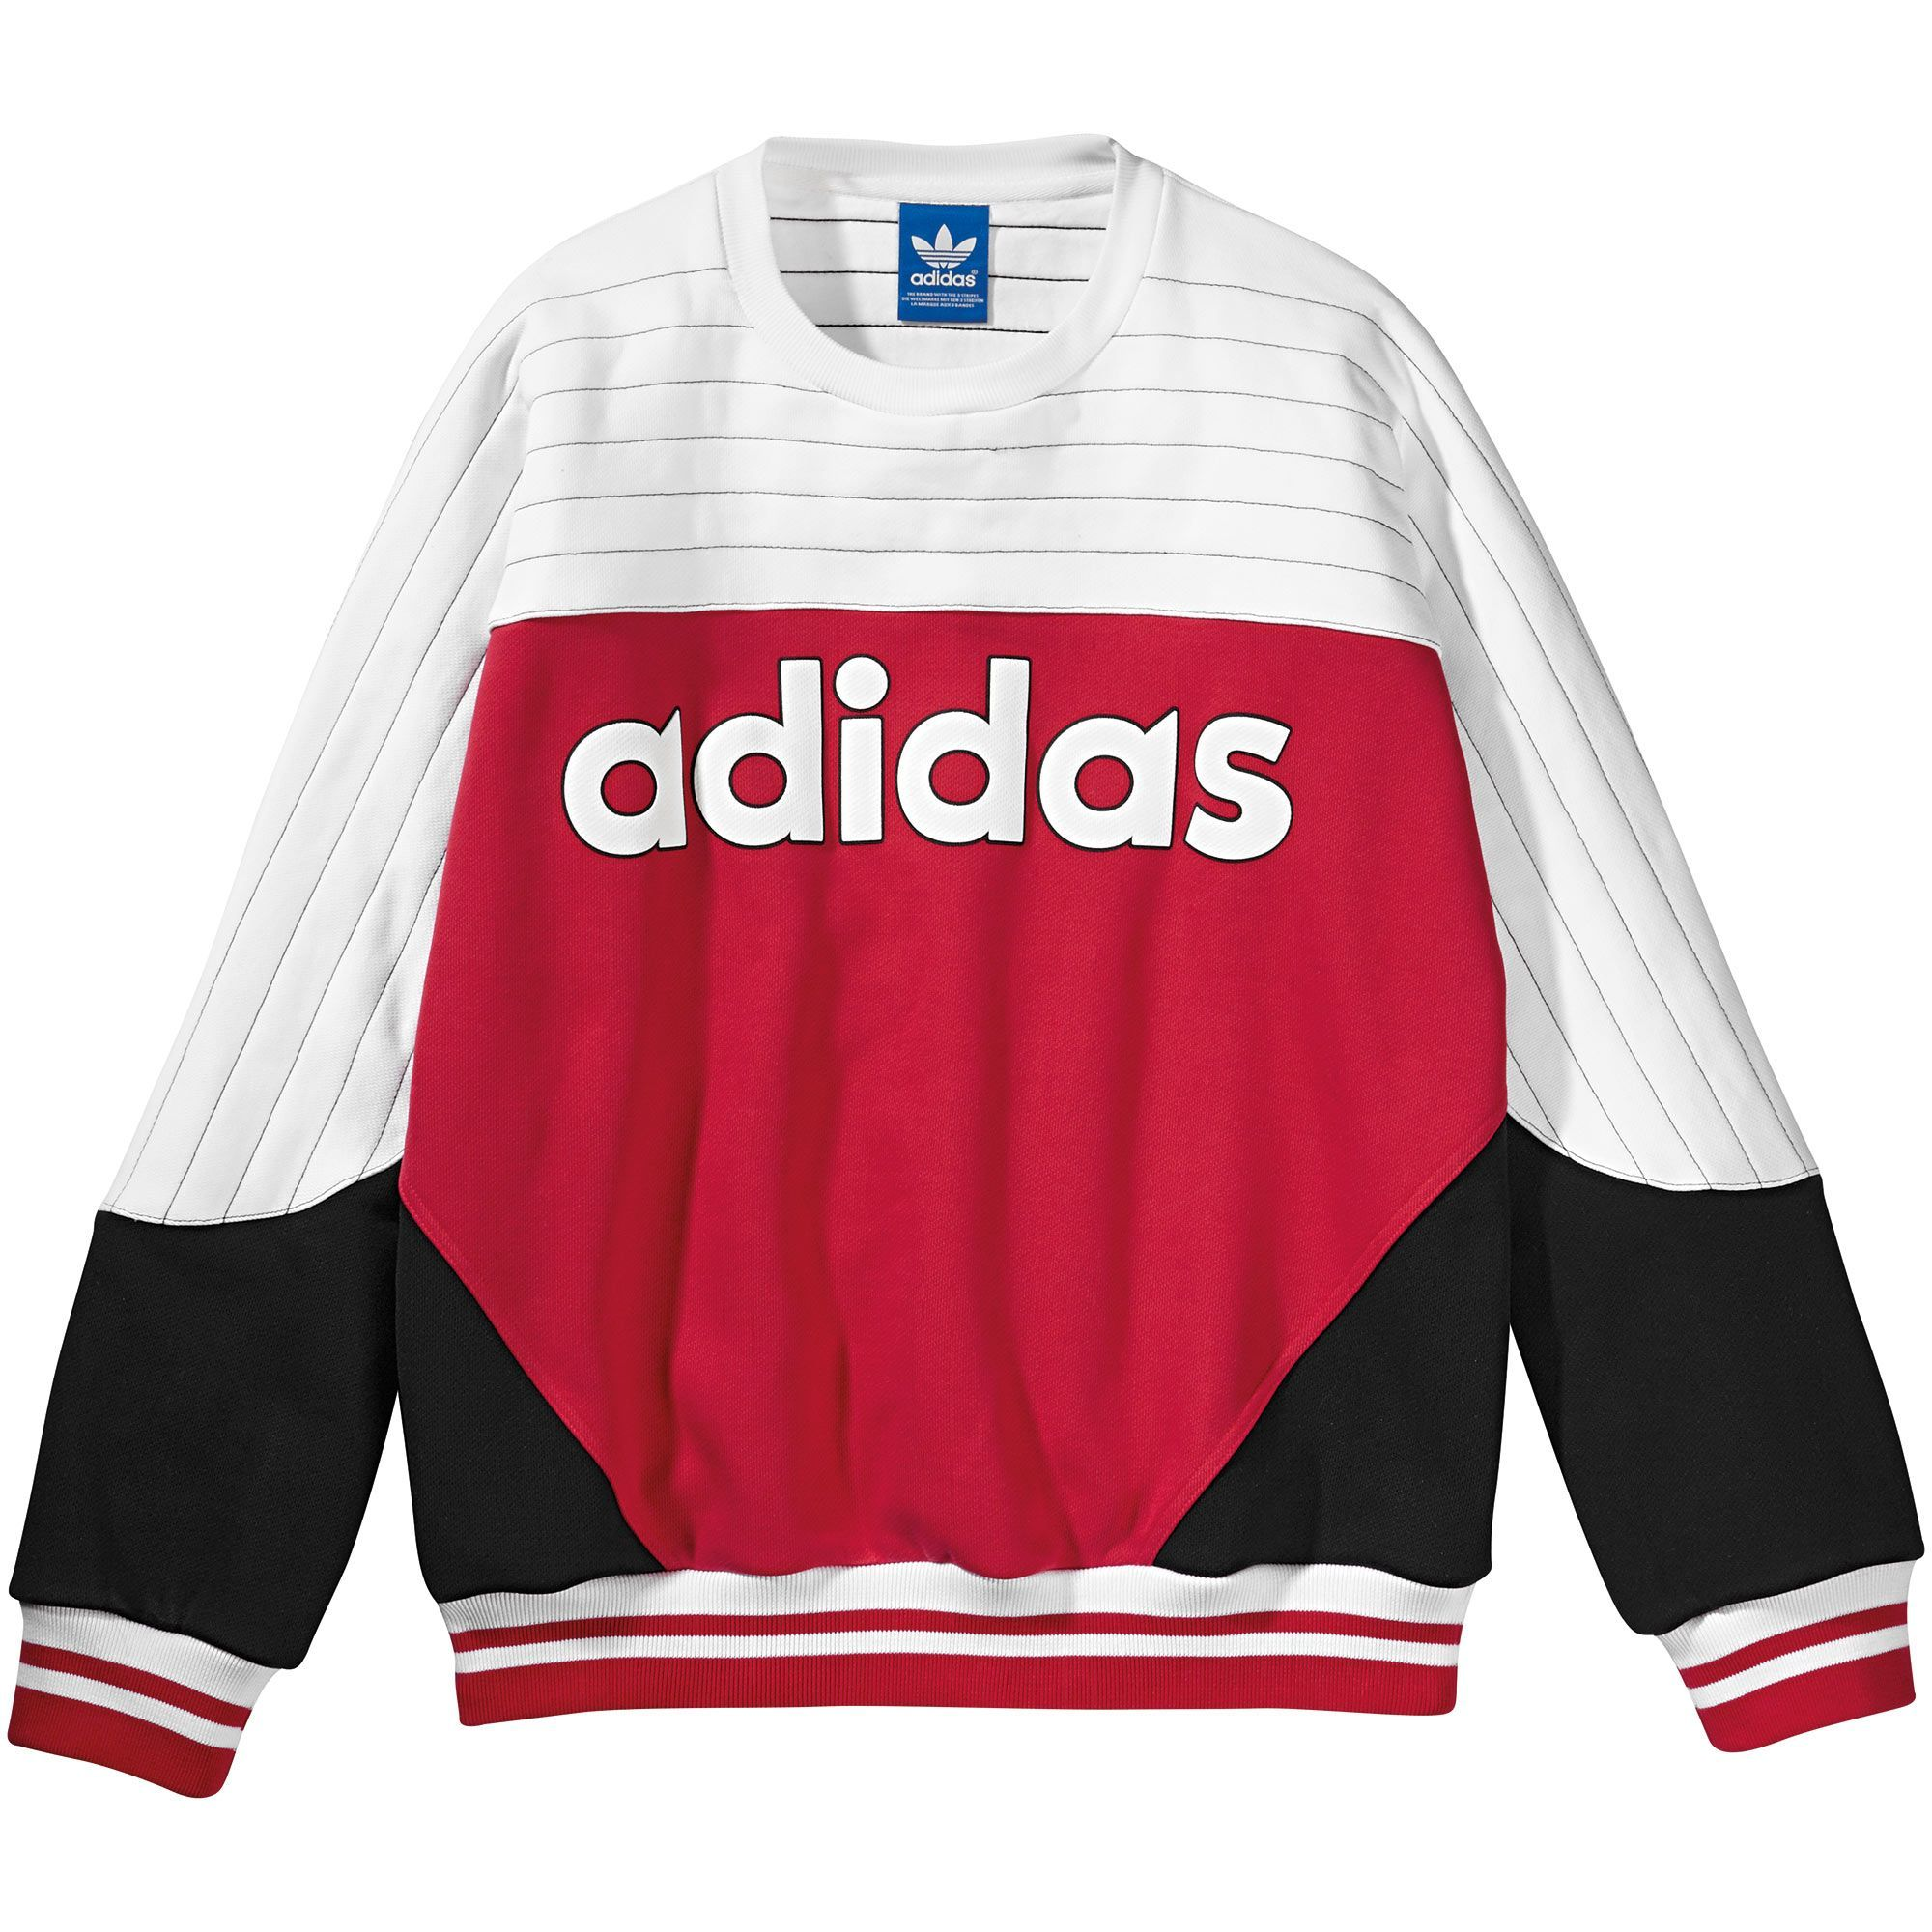 Adidas 25 Blocked Crew Sweatshirt Adidas Us Mens Sweatshirts Sweatshirts Adidas Sweatshirt [ 2000 x 2000 Pixel ]